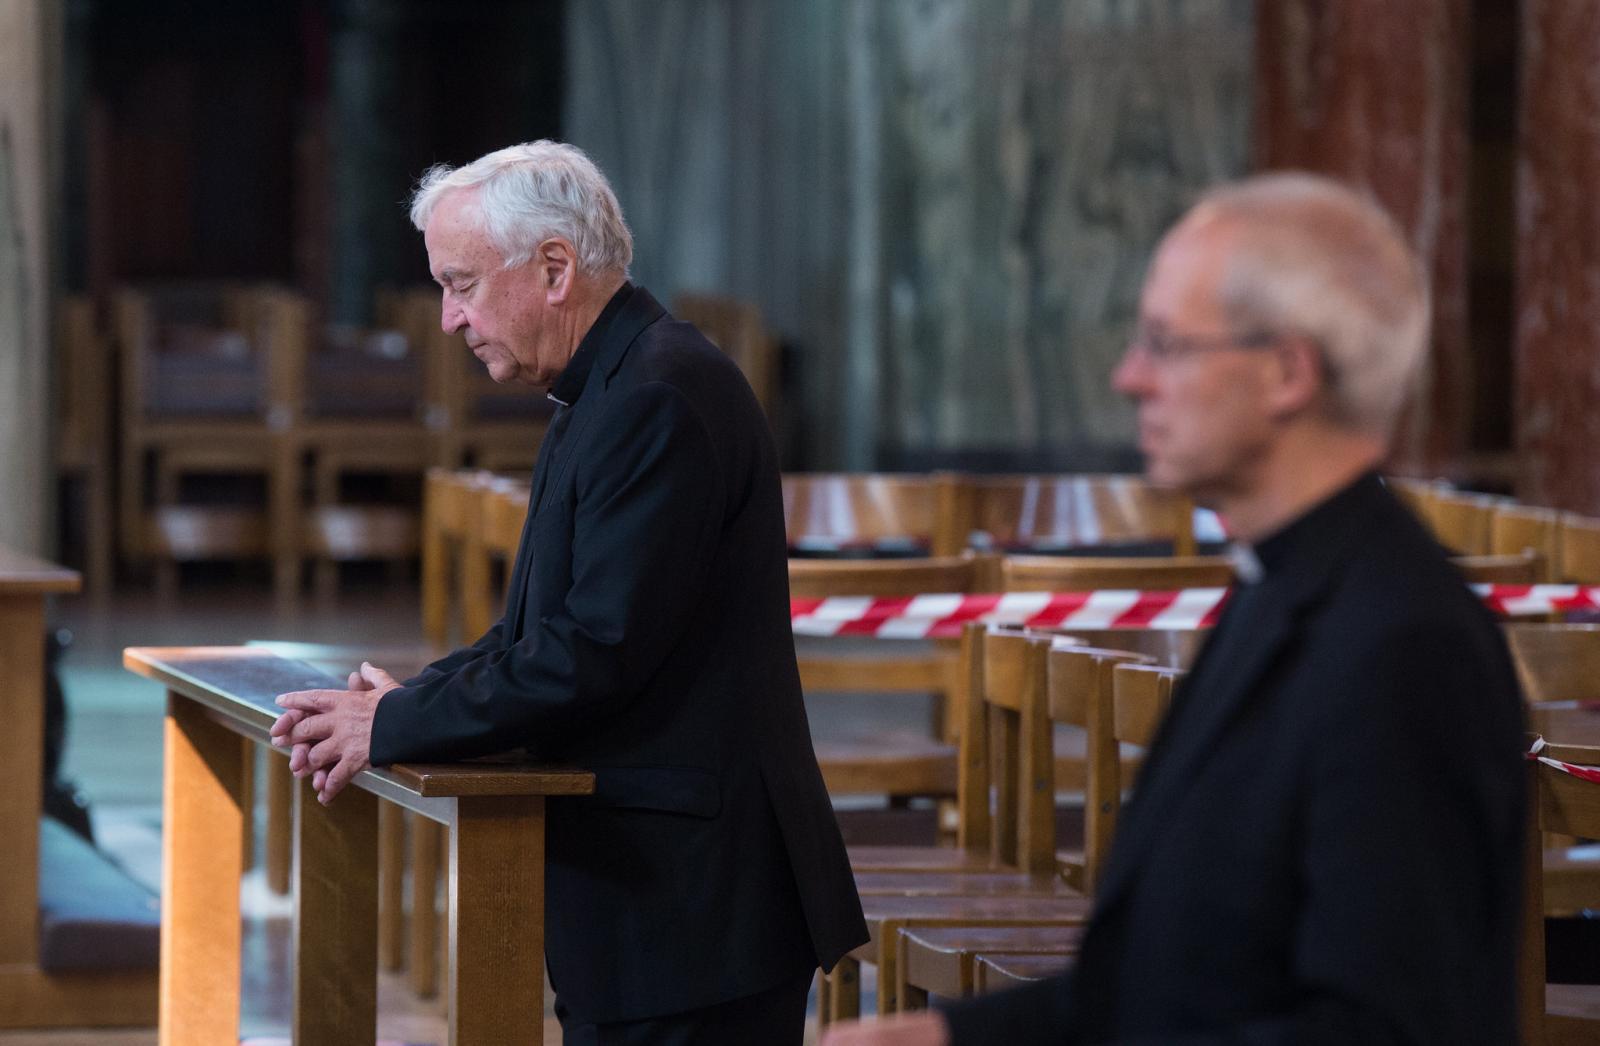 Cardinal prays for peace in Nagorno Karabakh